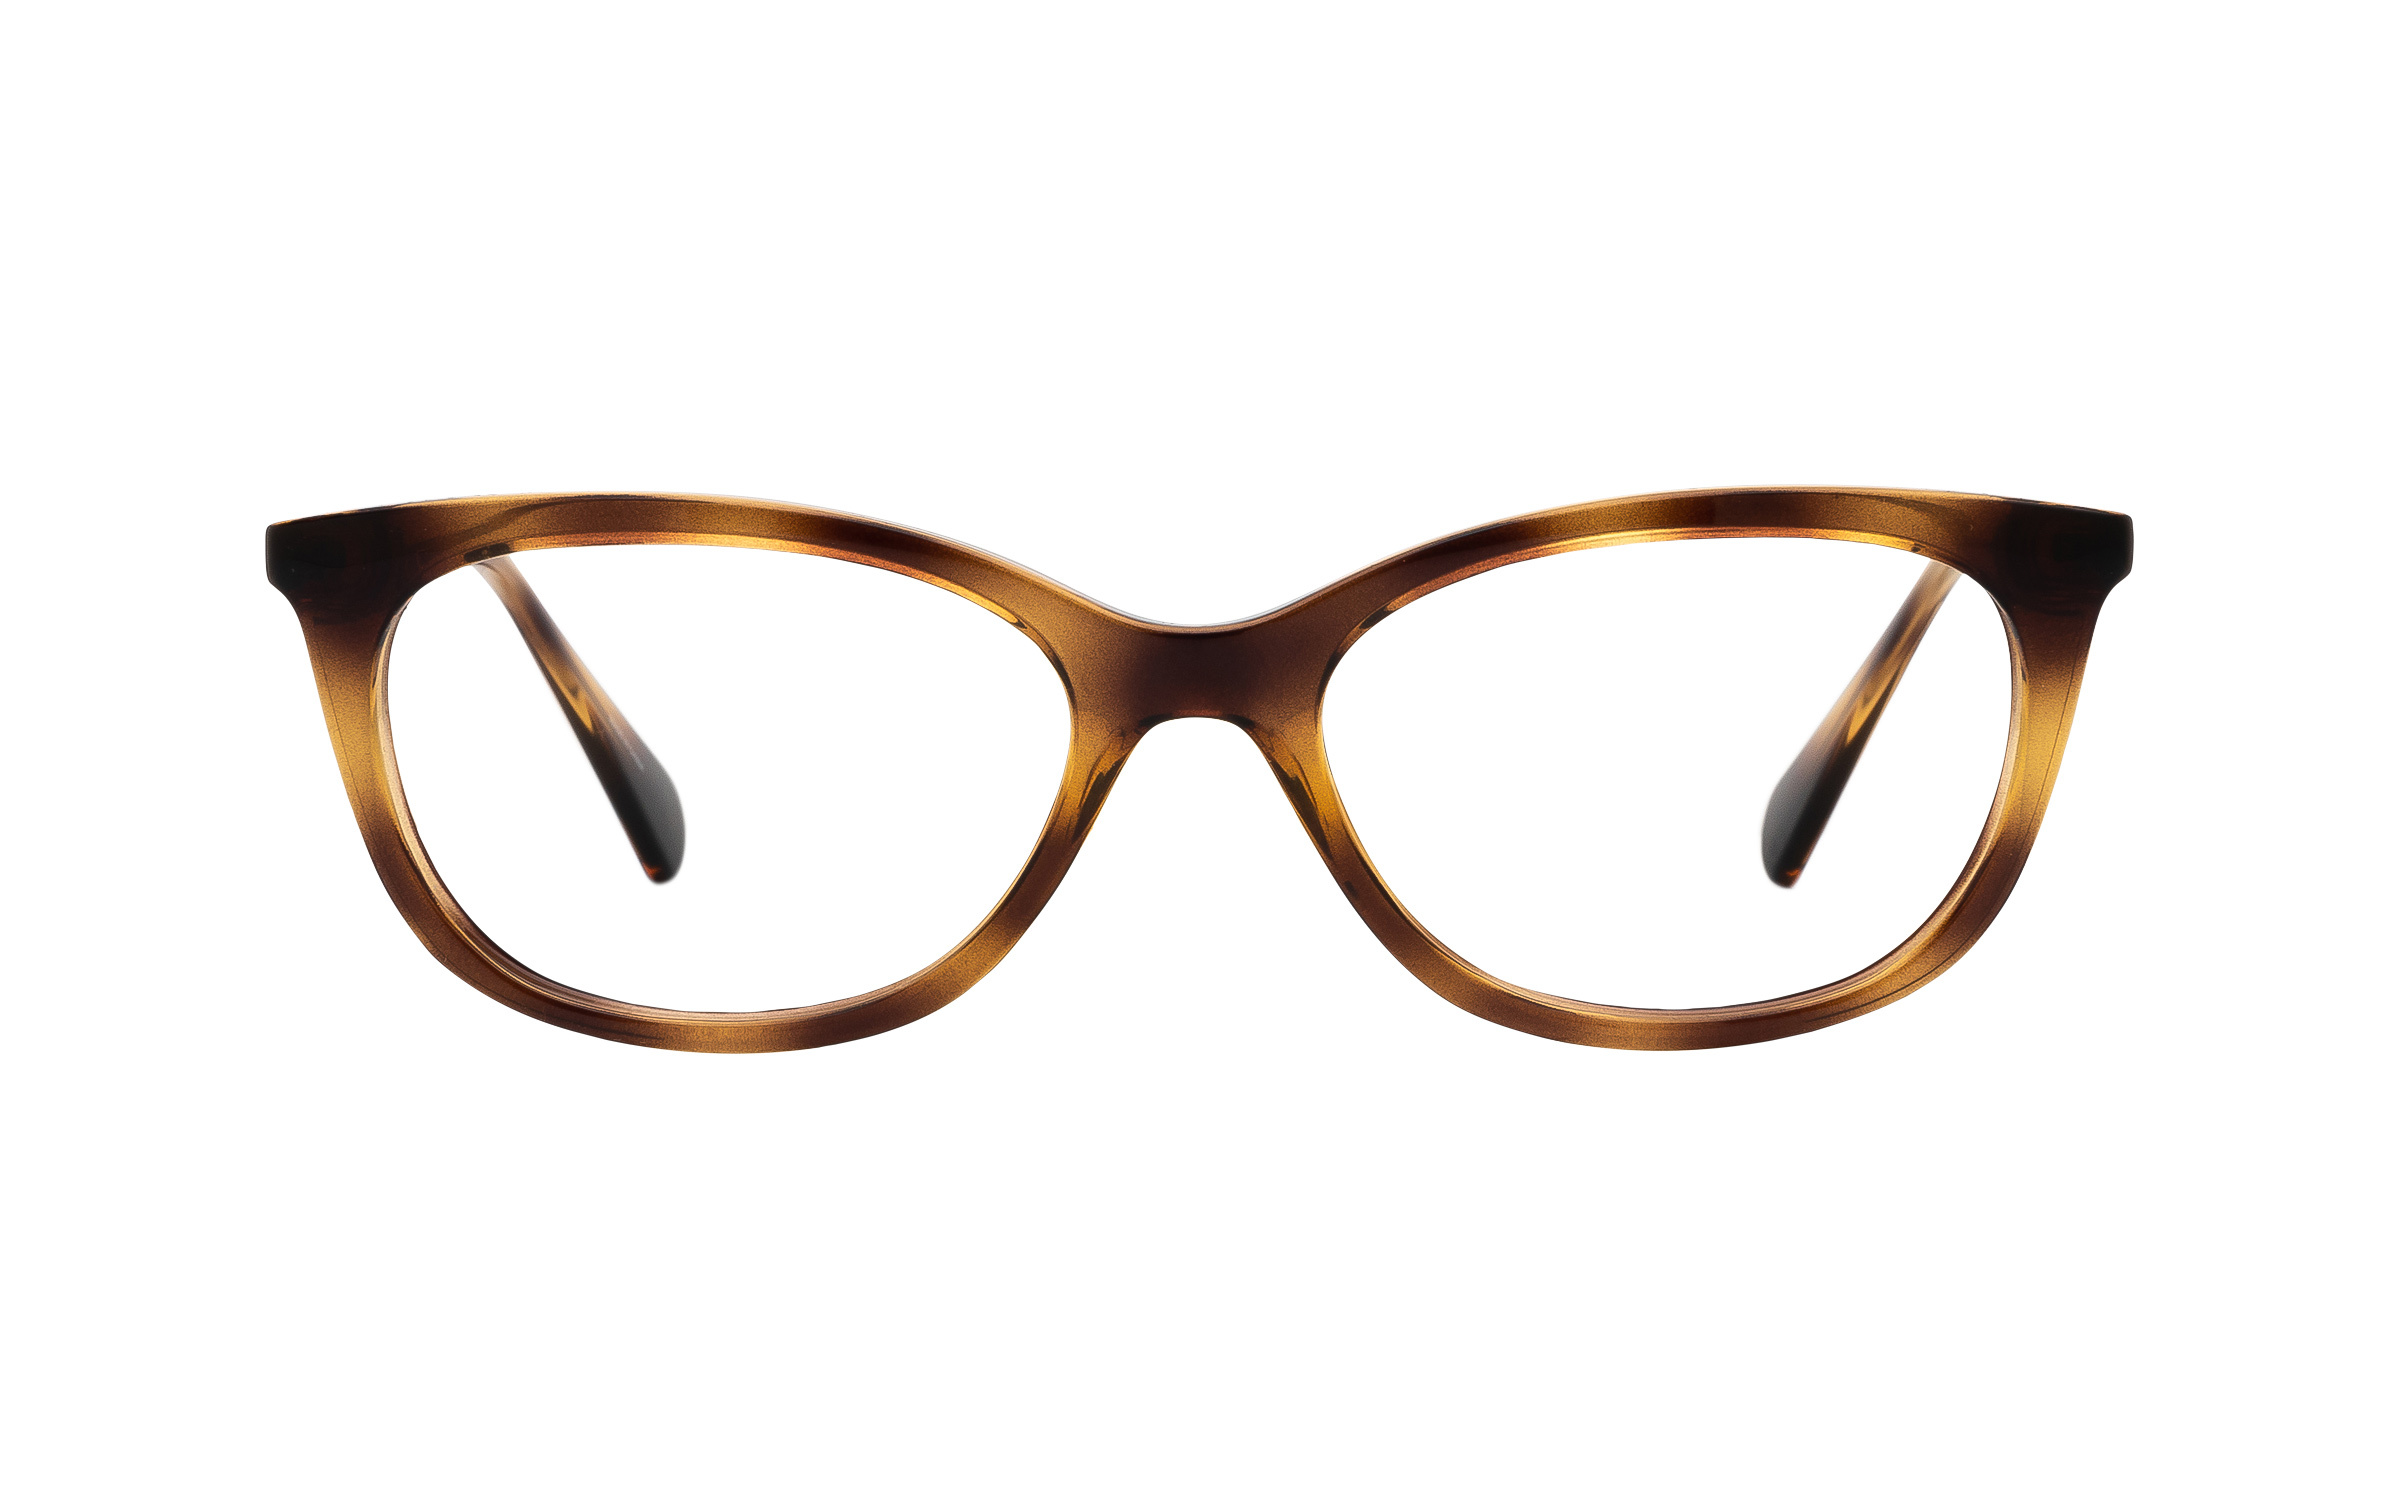 coastal.com - Ralph by Ralph Lauren RA7085 1378 (51) Eyeglasses and Frame in Dark Havana Tortoise/Brown | Acetate – Online Coastal 154.00 USD